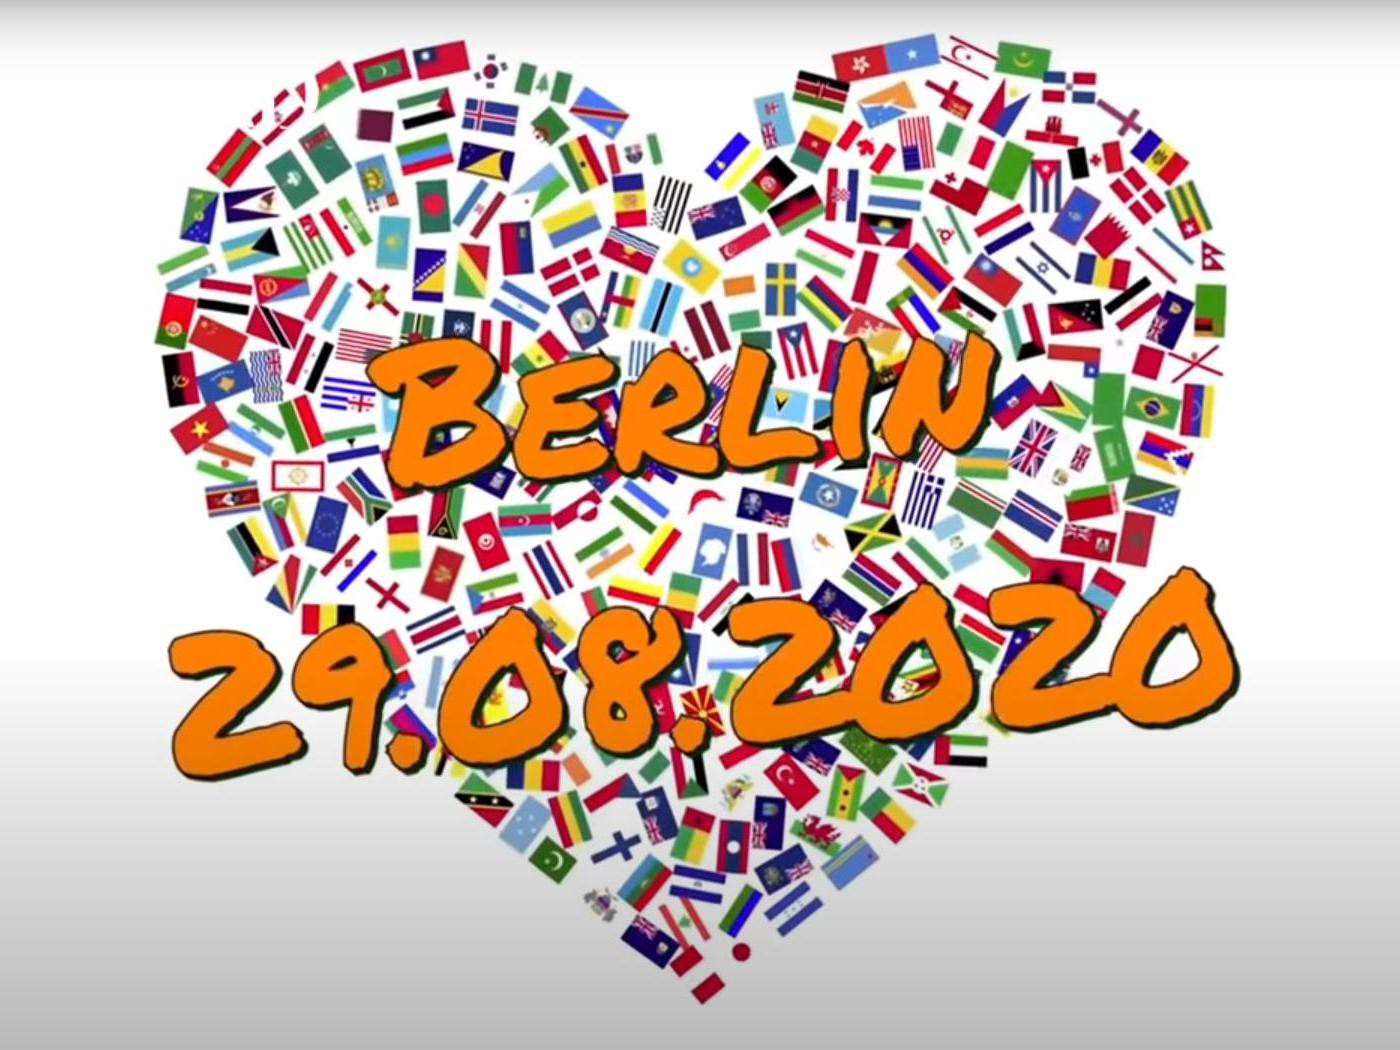 Berlin invites Europe 29.08.2020